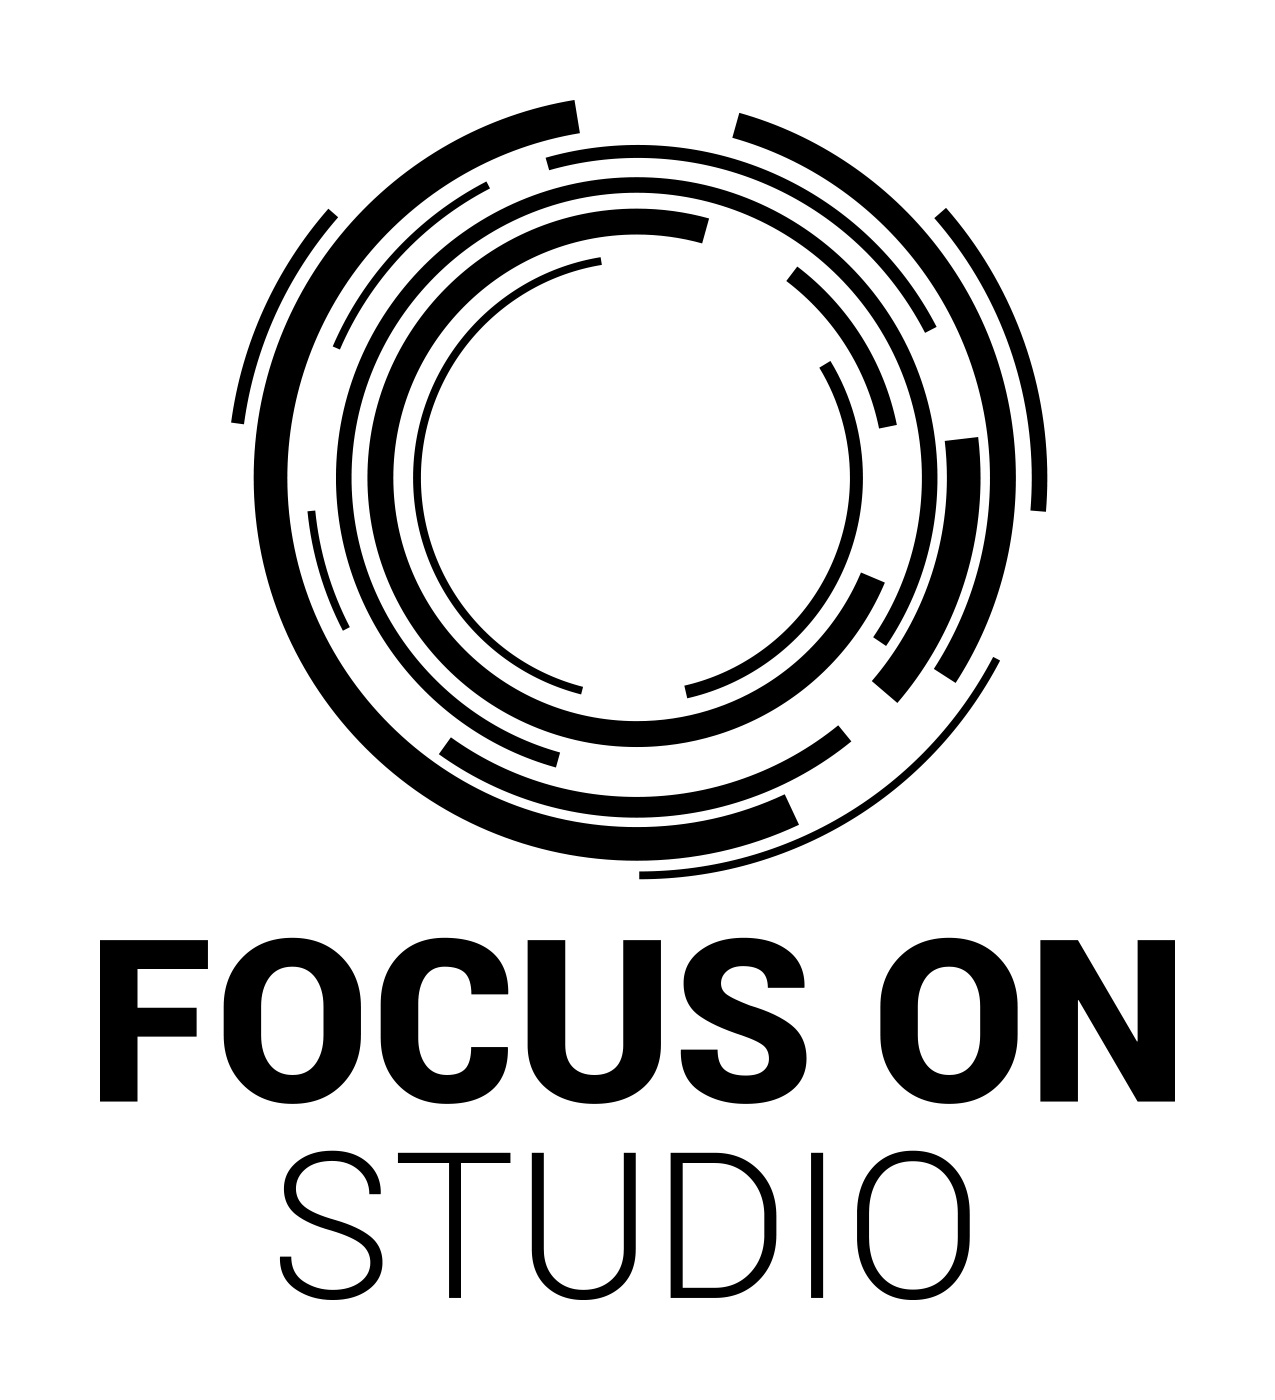 FocusOnStudio